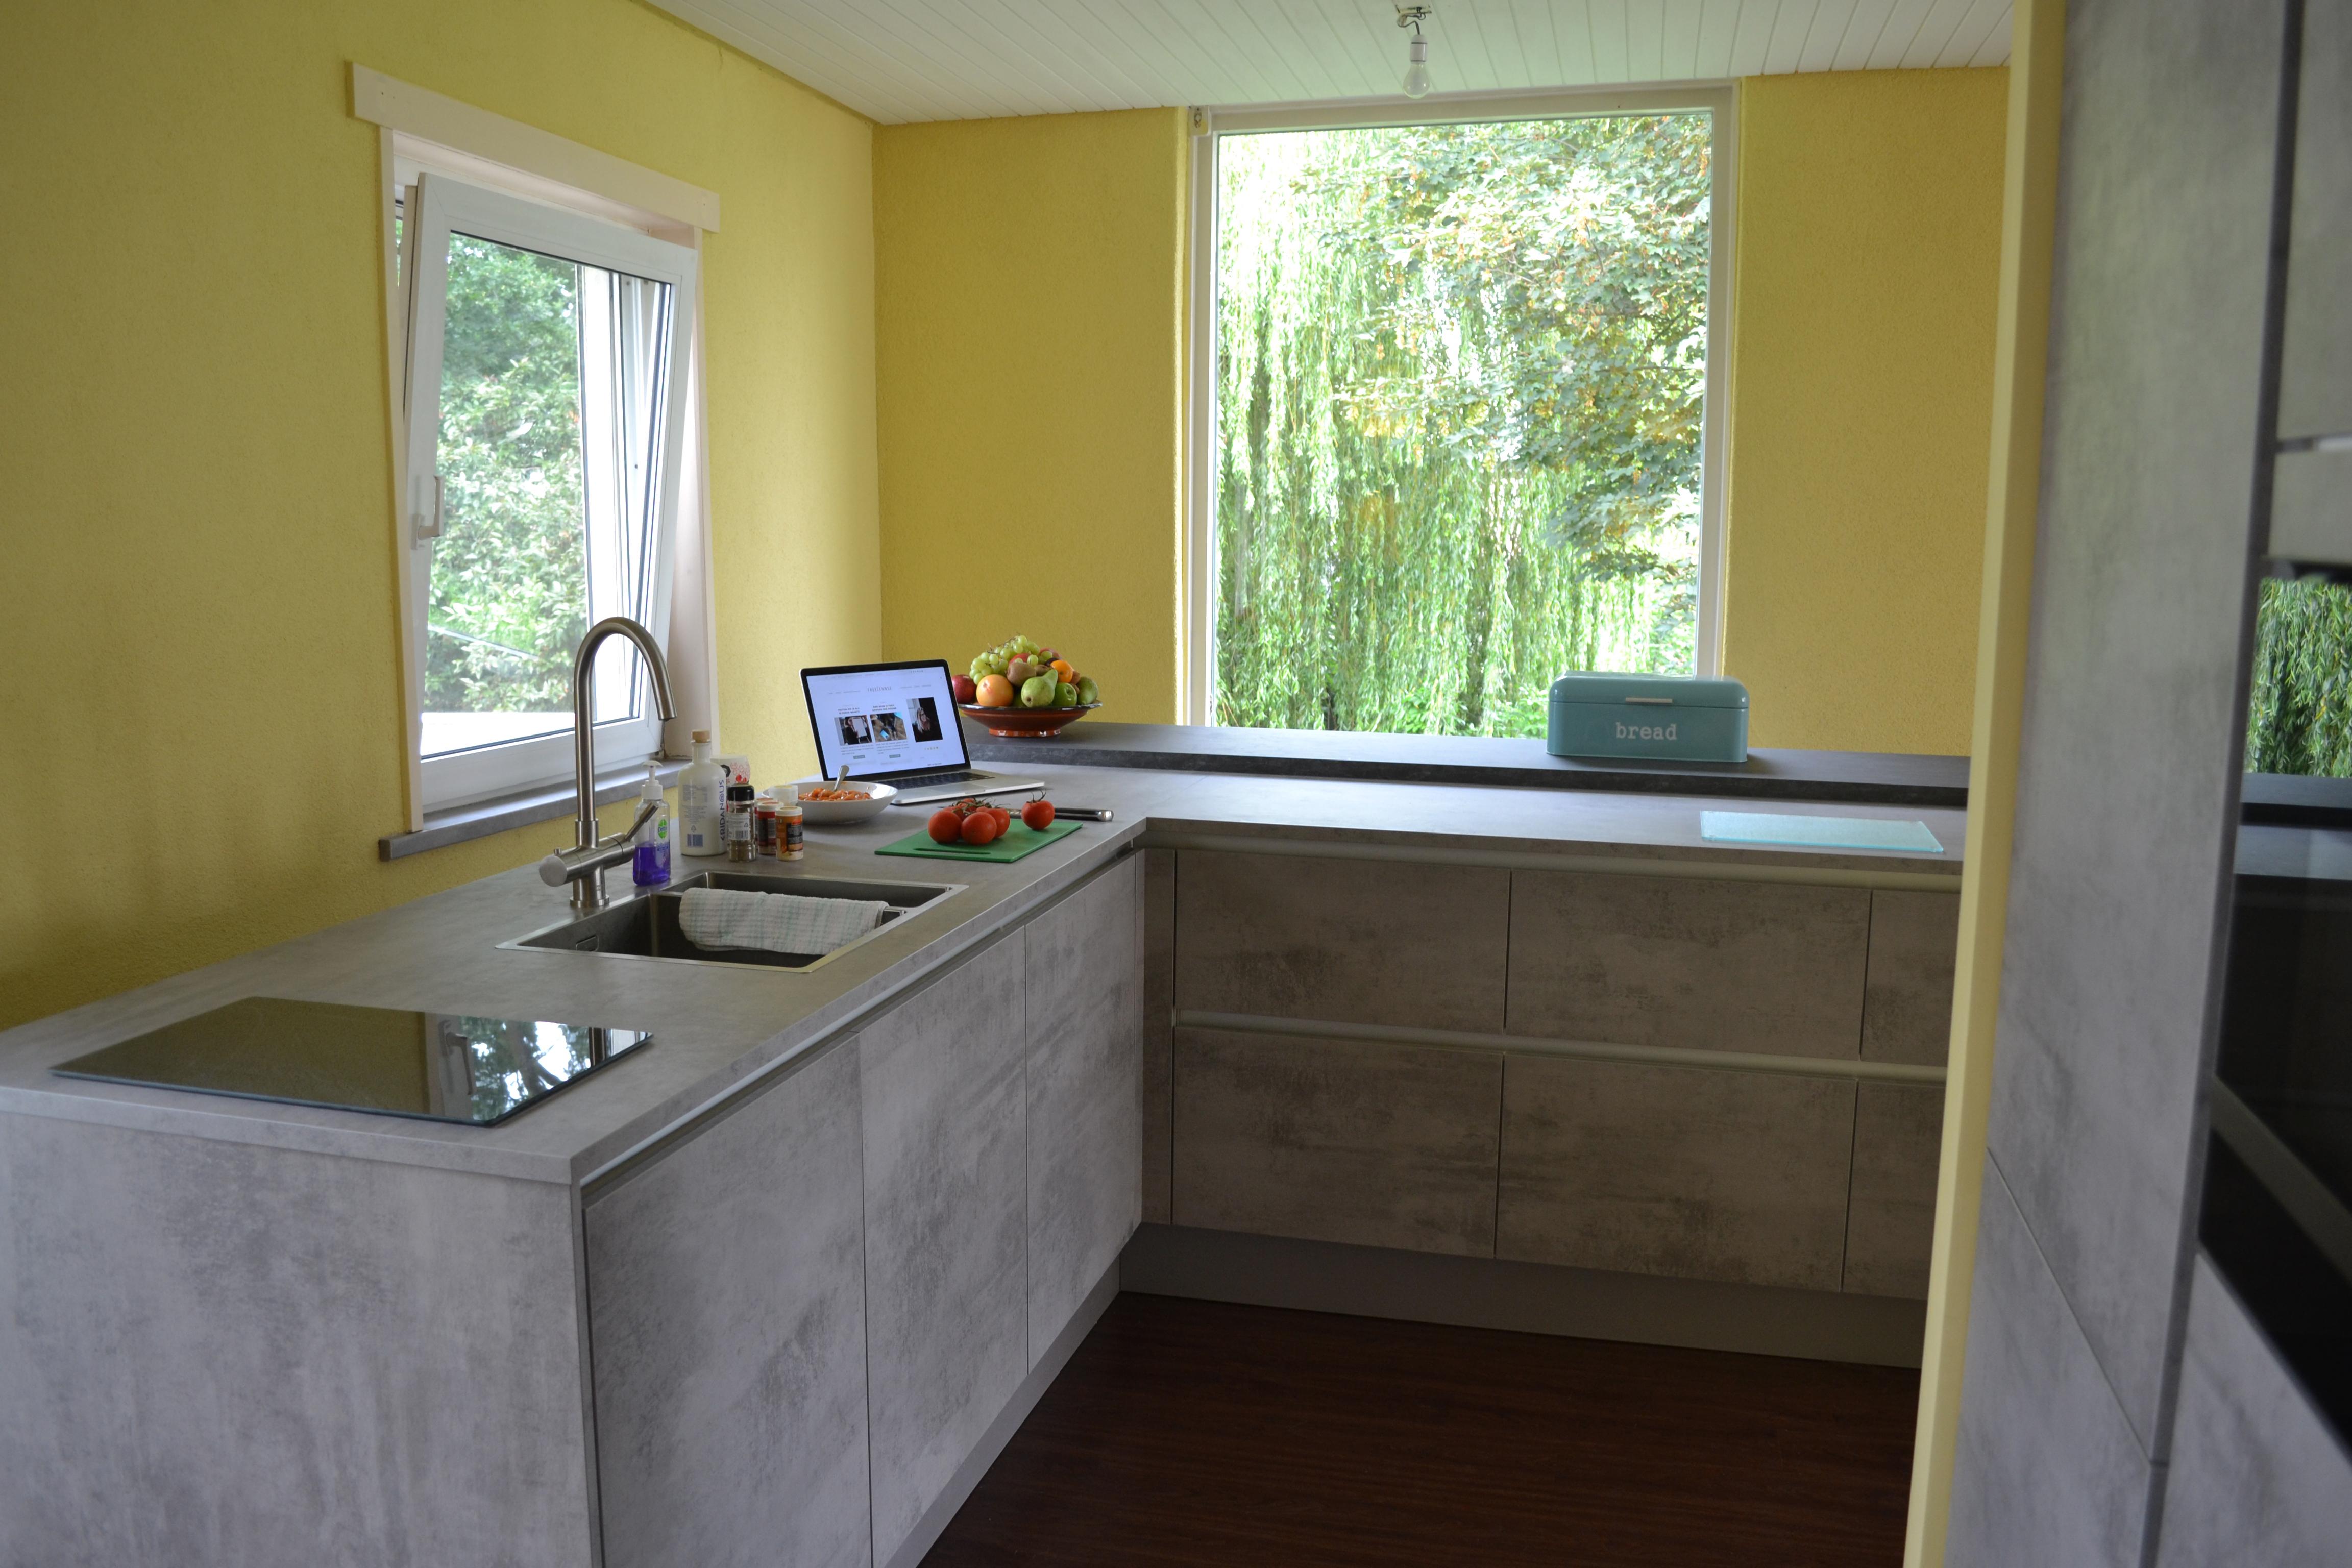 Betonnen keuken Hello Kitchen Duiven